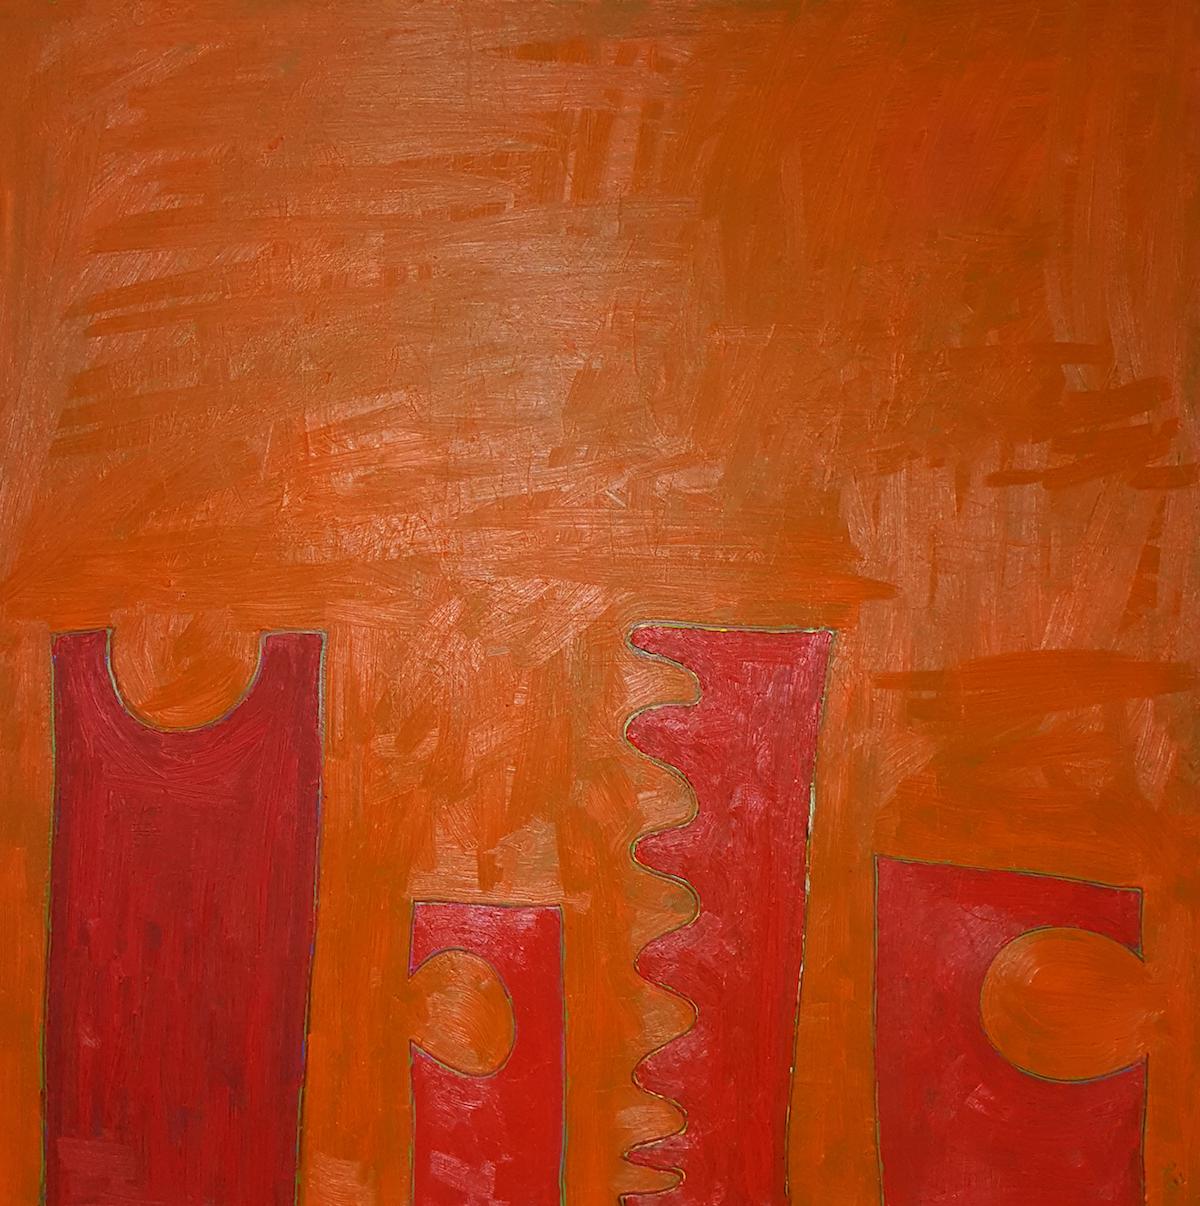 Untitled oil om board 27x27 Radoslaw Zipper.png